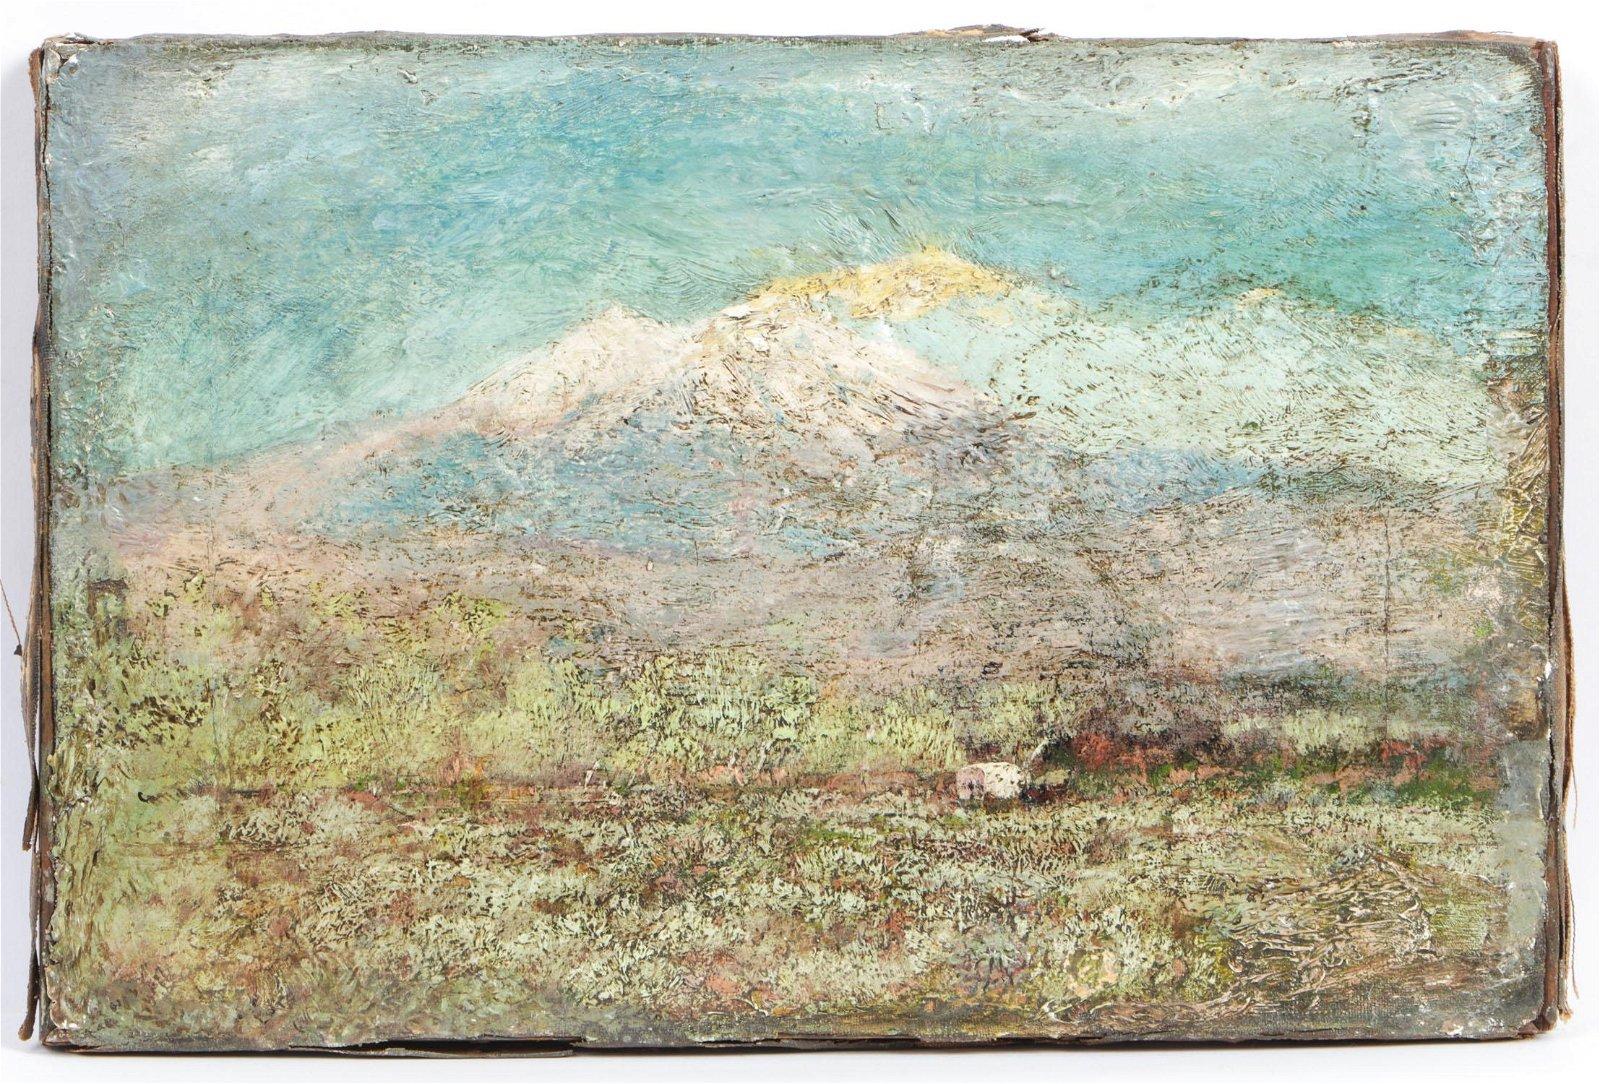 Attributed to Charles Partridge Adams (1858-1942)